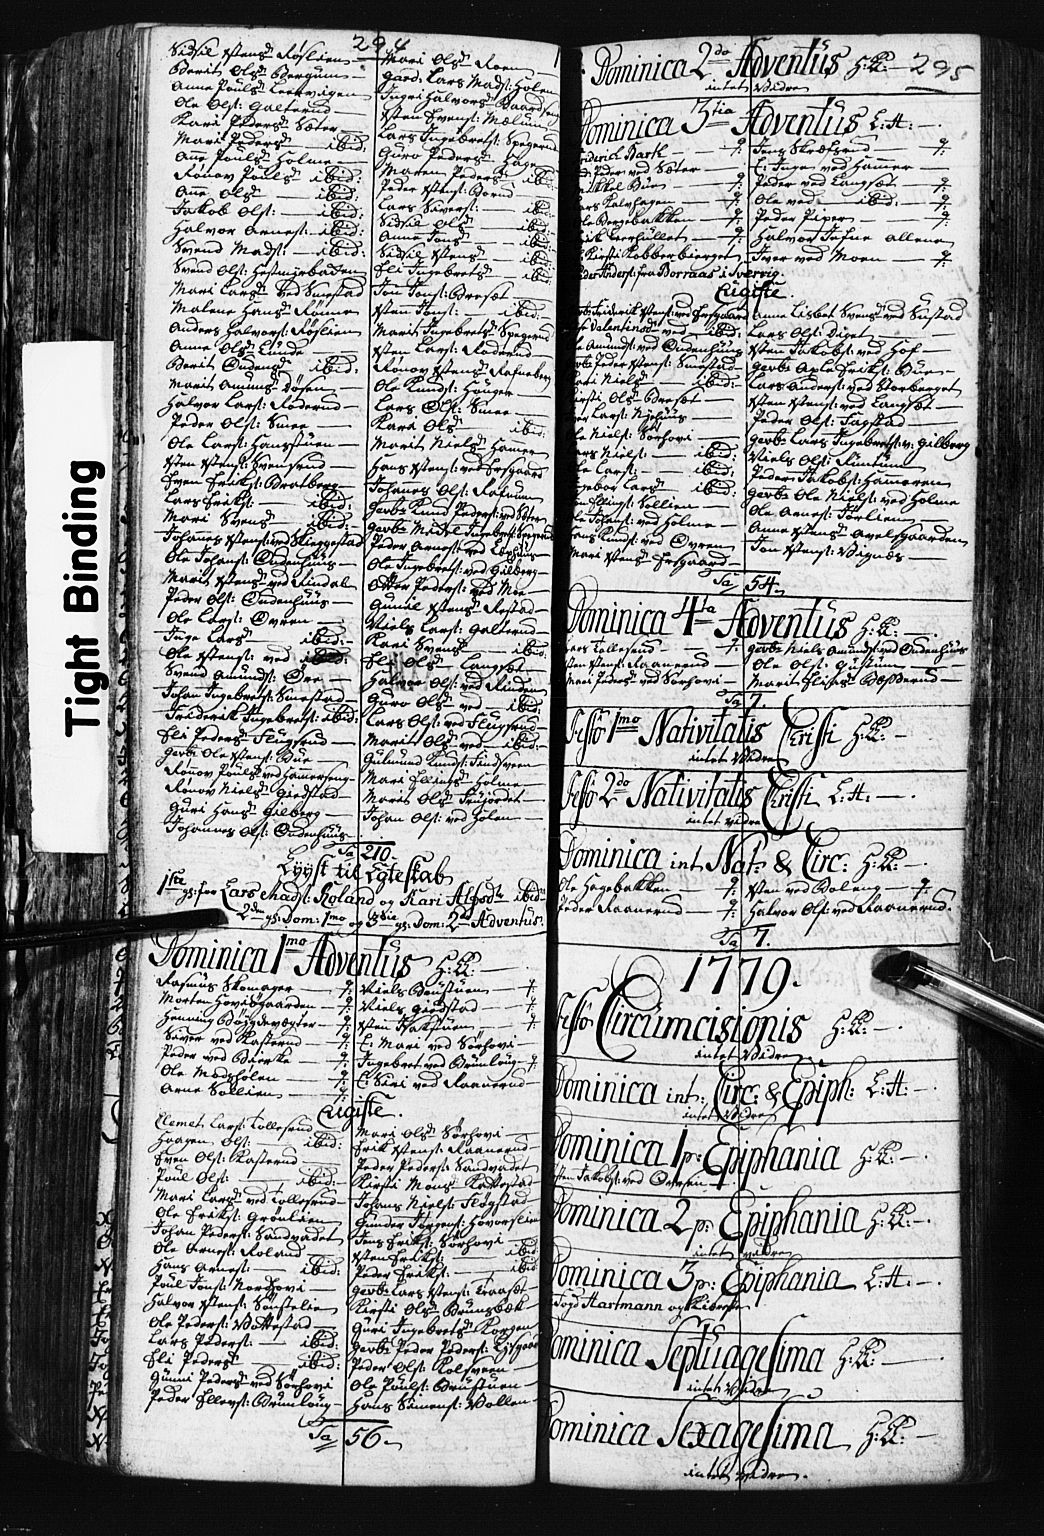 SAH, Fåberg prestekontor, Klokkerbok nr. 3, 1768-1796, s. 294-295